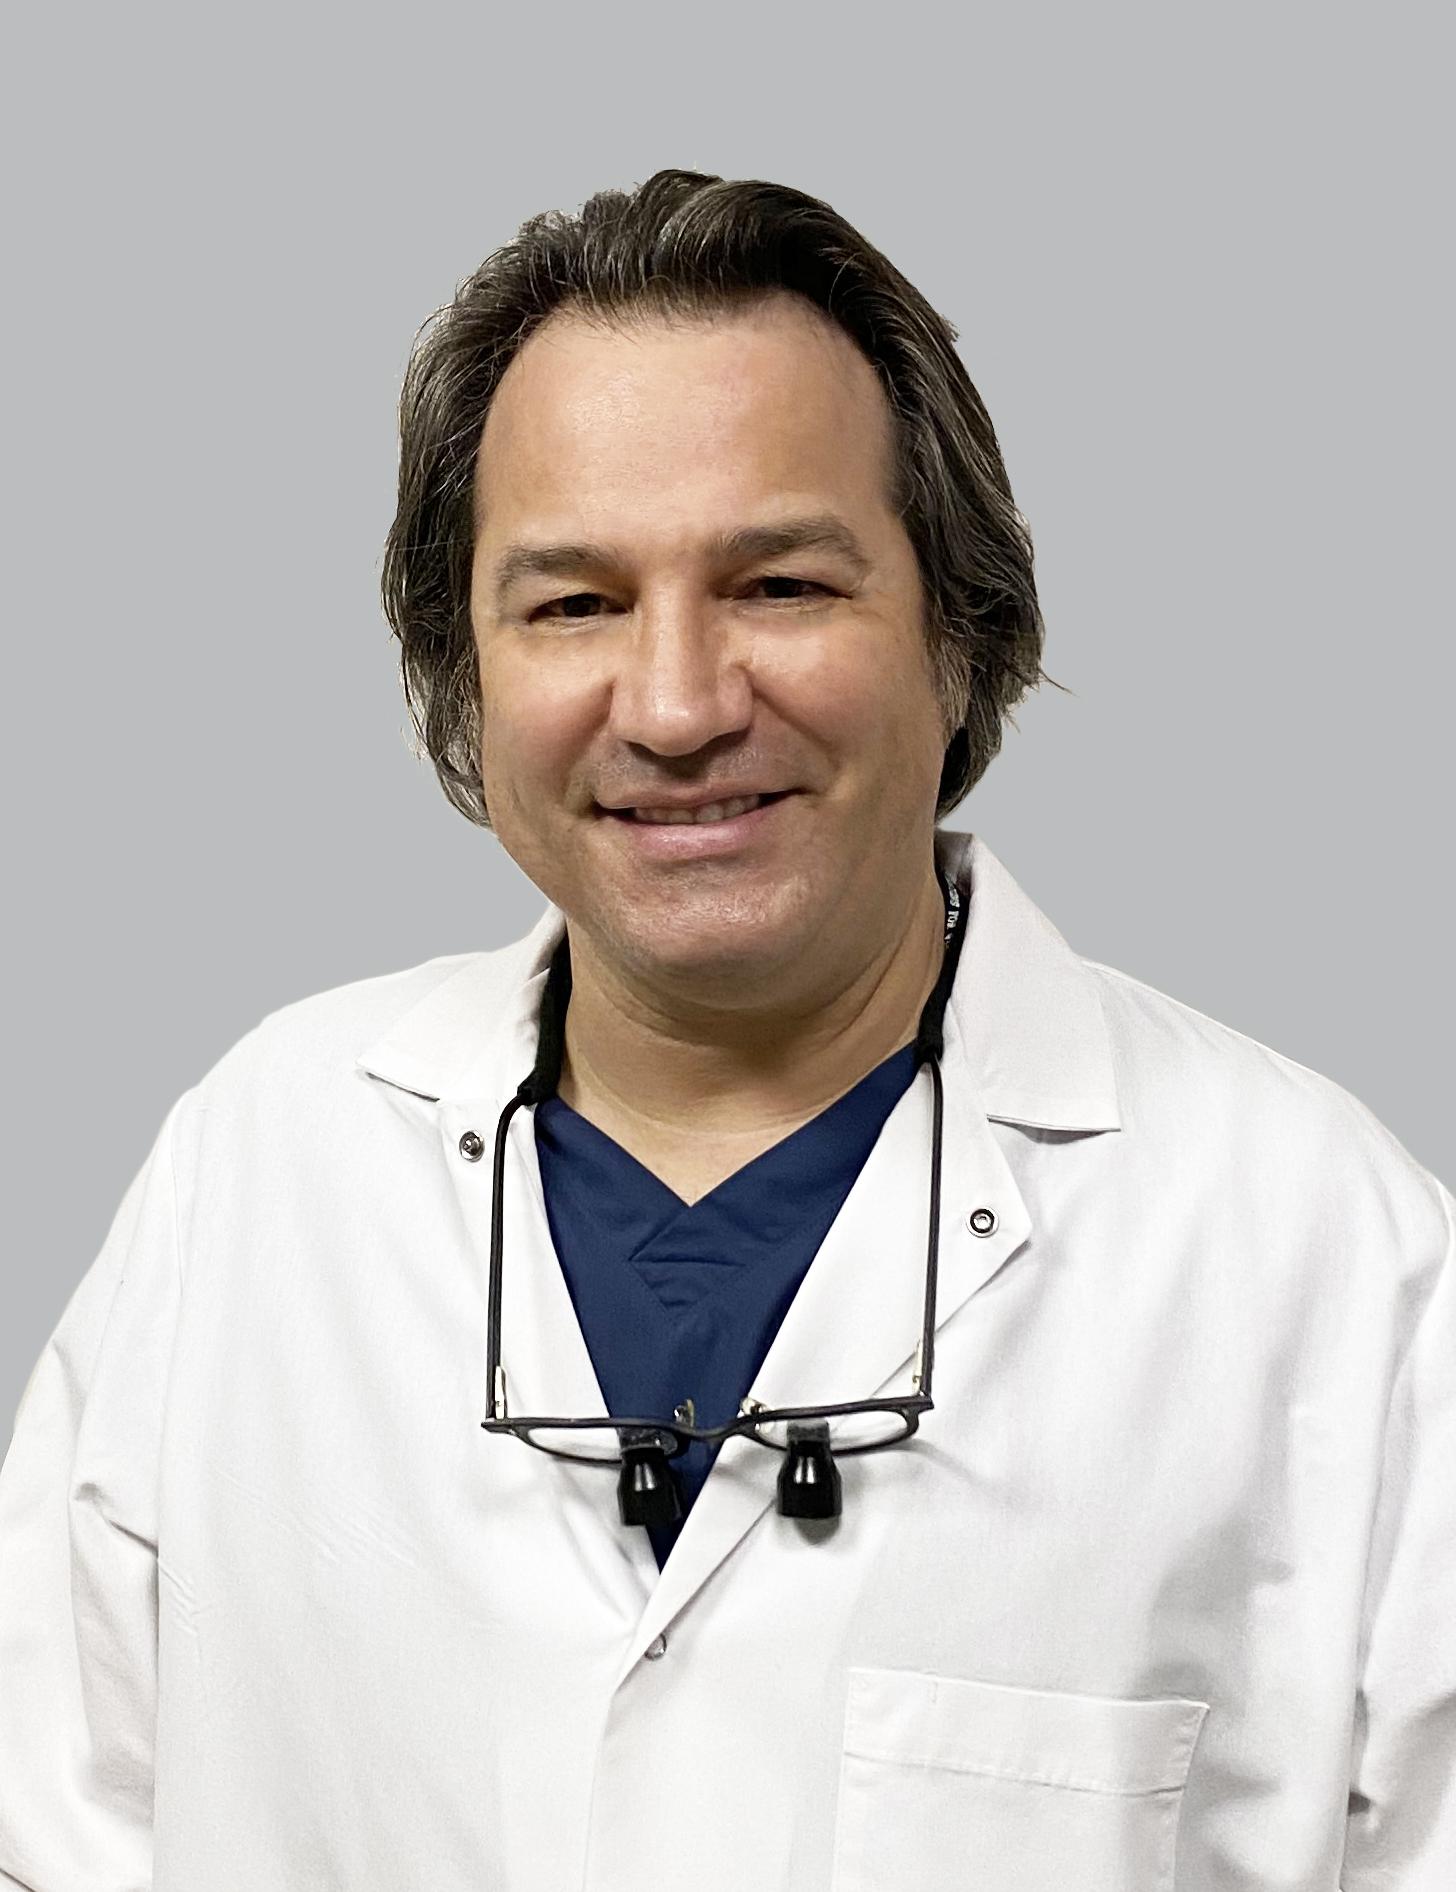 Dentist NYC - Dr. John Osterman Prosthodontist & Dental Implant Specialist